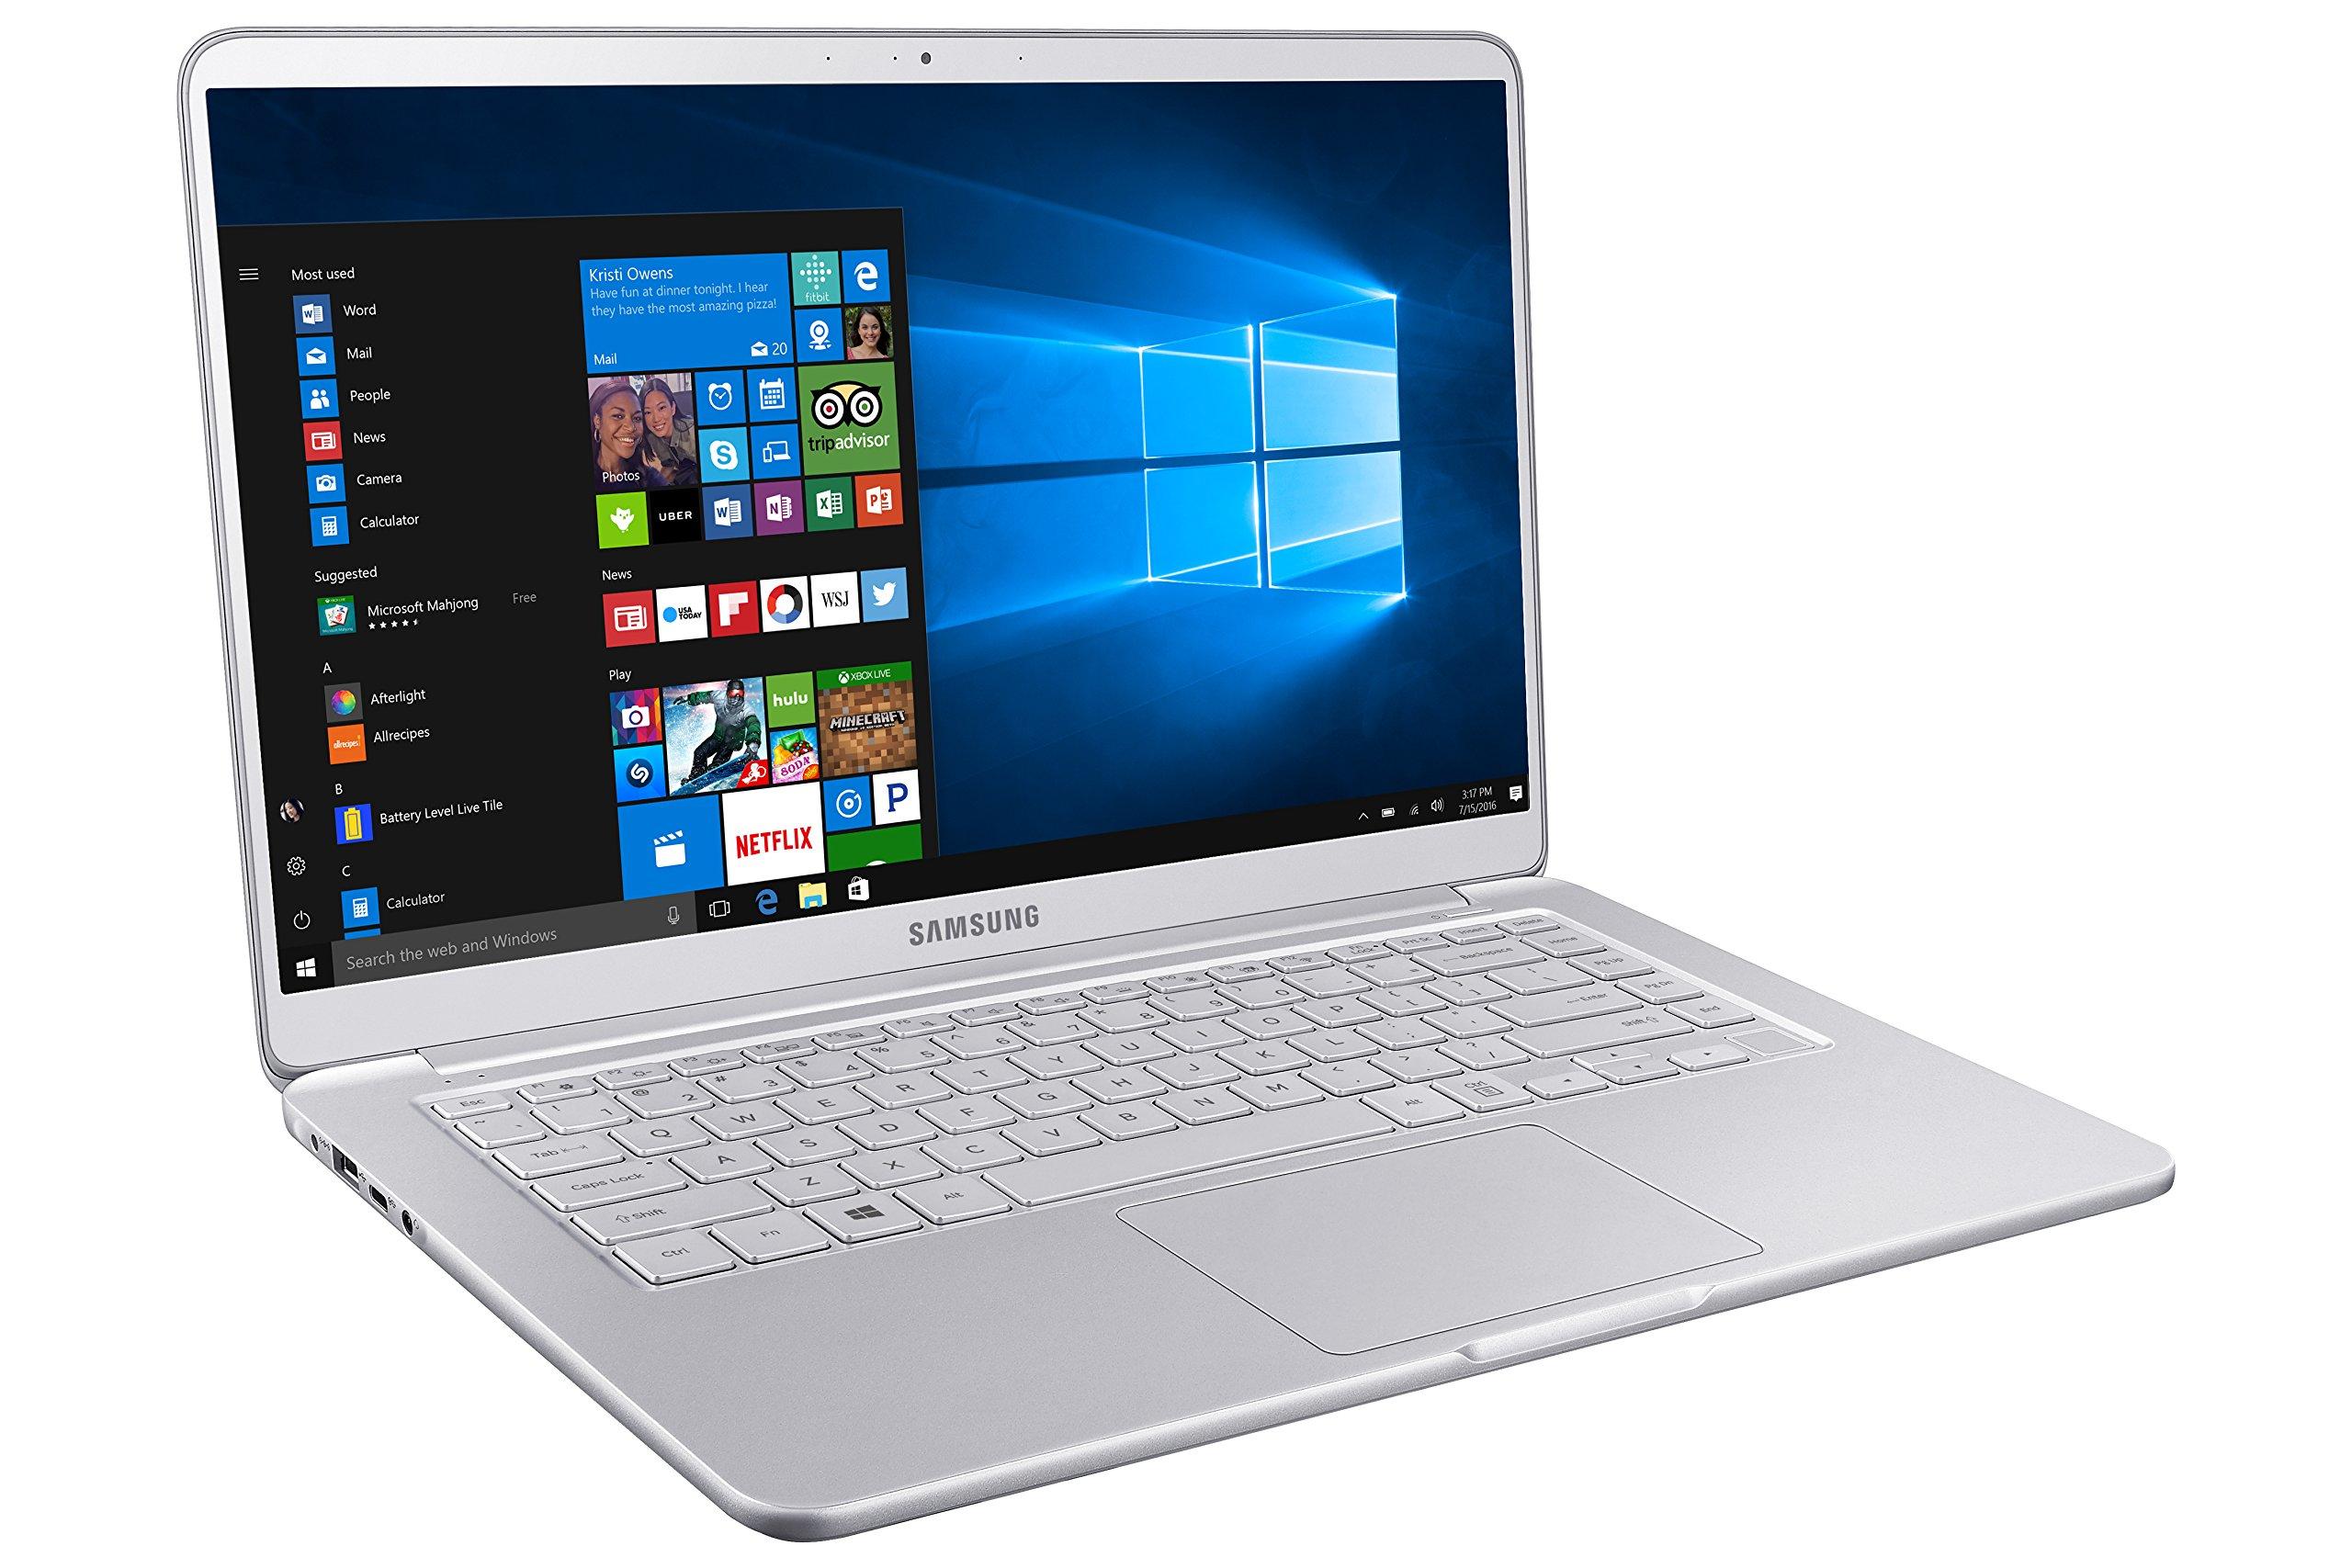 Samsung Notebook 9 NP900X5N-X01US 15.0'' Traditional Laptop (Light Titan)